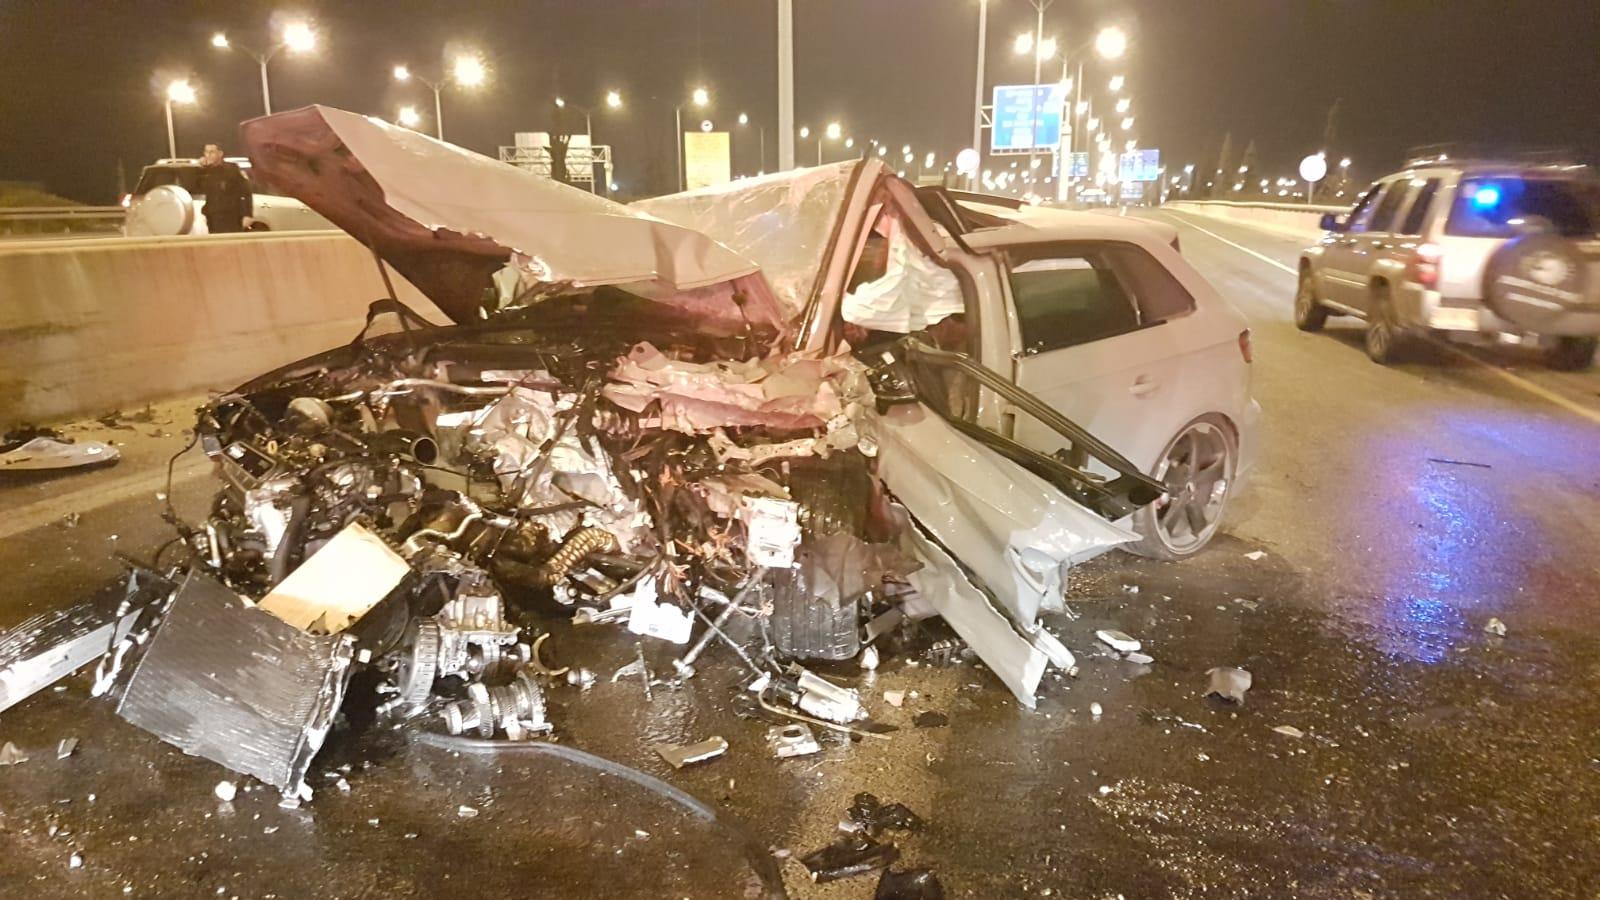 Photo of תאונה קטלנית הלילה במחלף ראשונים: בן 25 נהרג לאחר שאיבד שליטה על רכבו